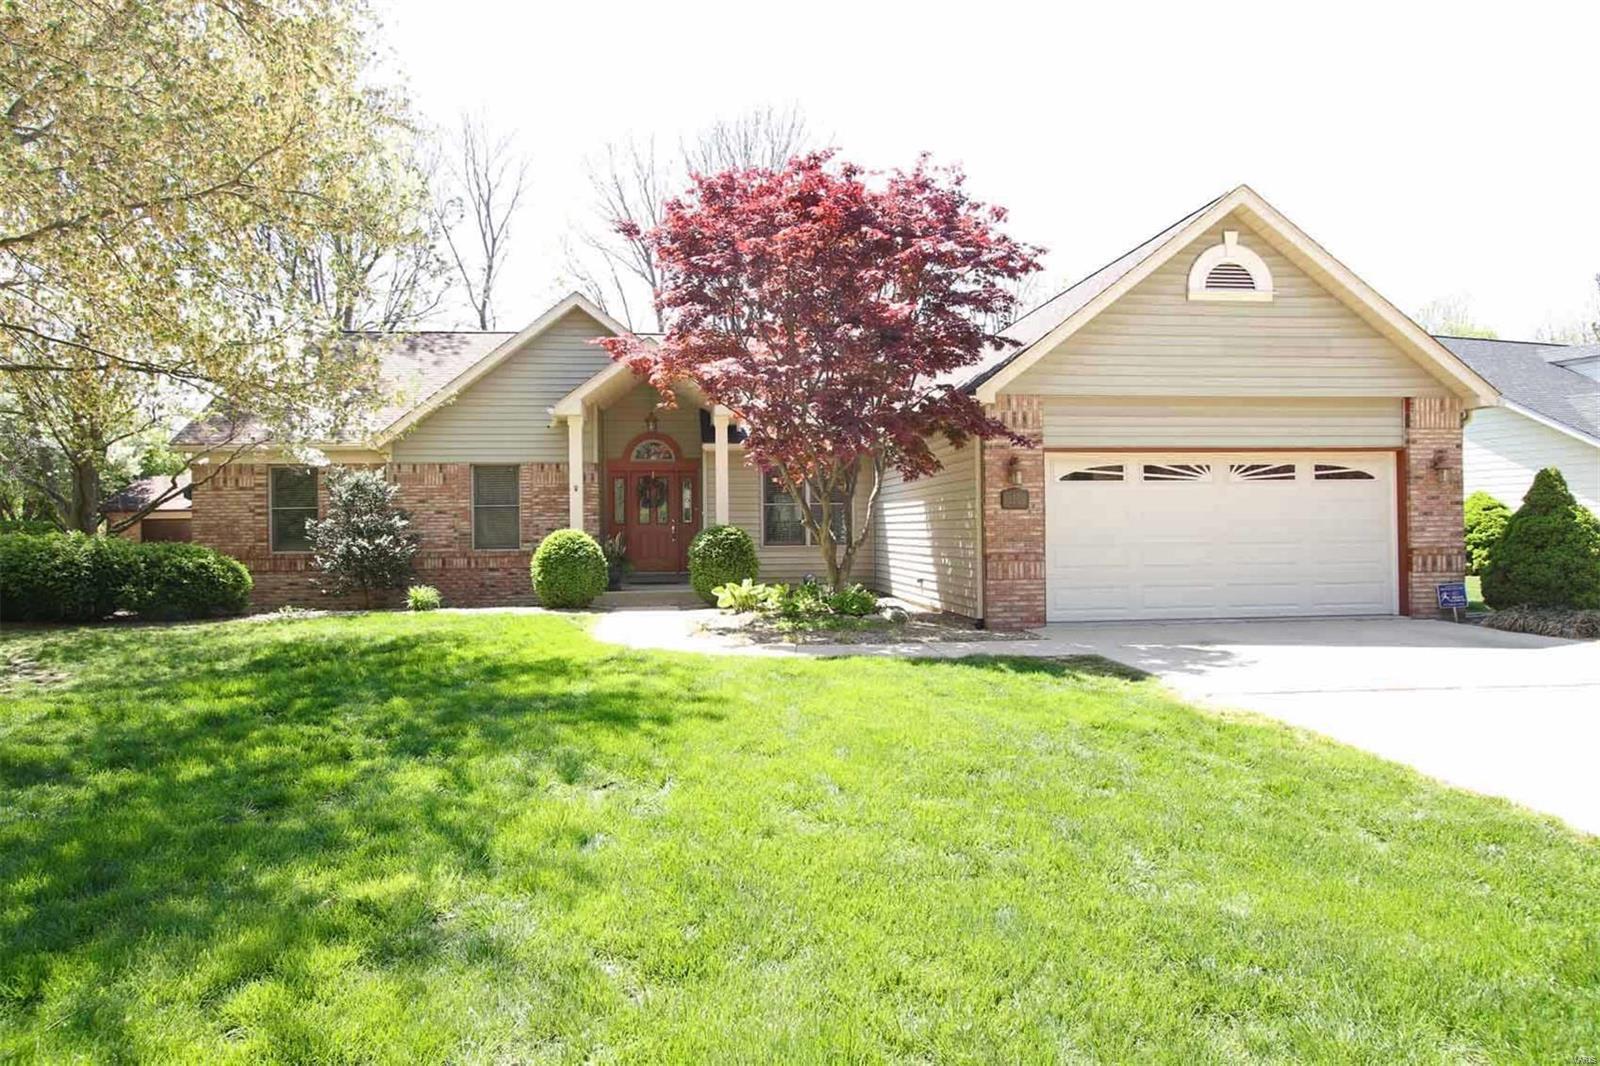 57 Santa Anita Drive Property Photo - Maryville, IL real estate listing